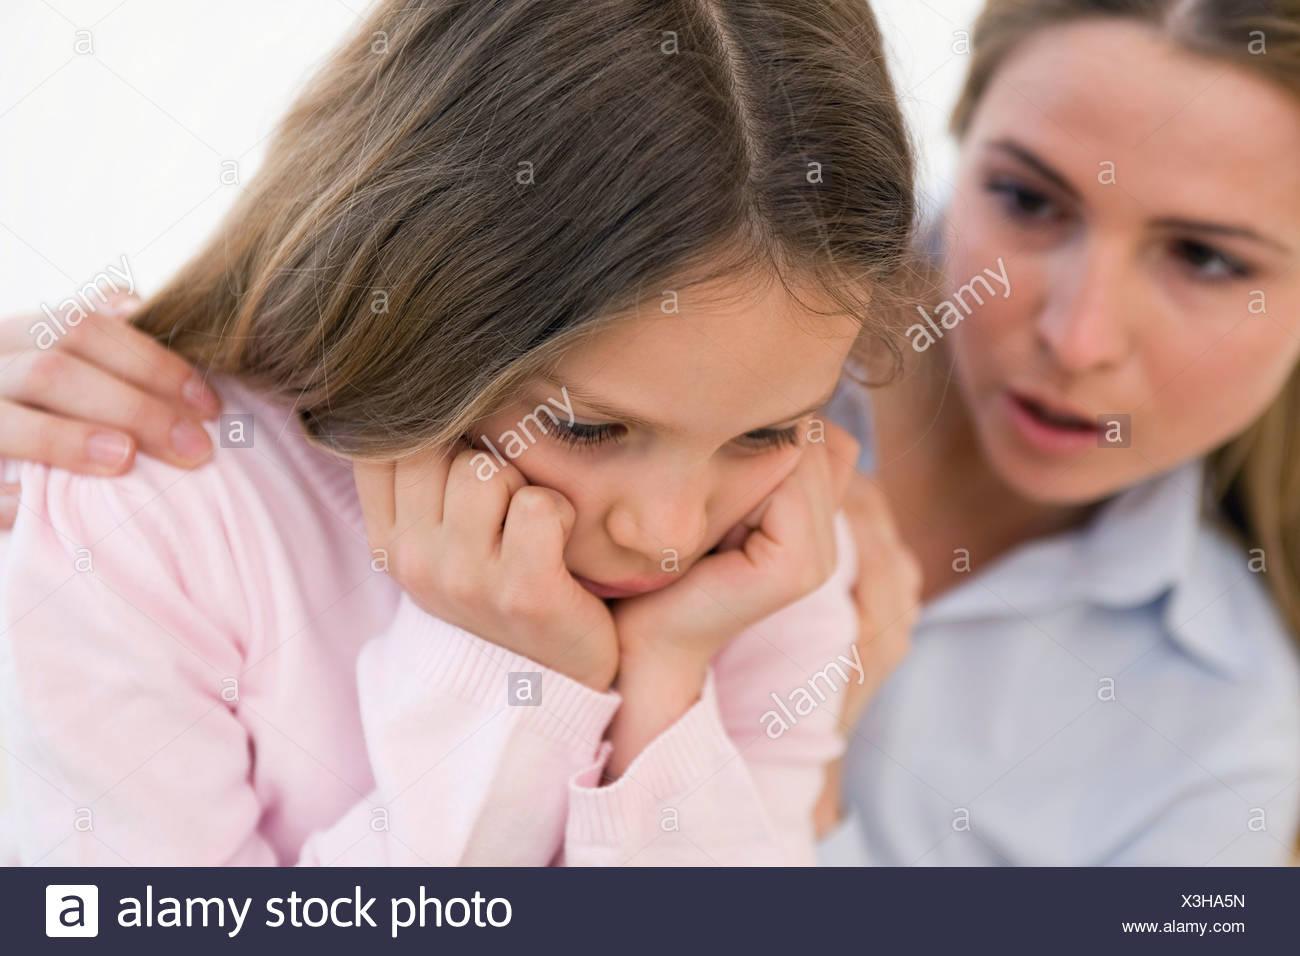 Portrait mother consoling daughter, studio shot - Stock Image